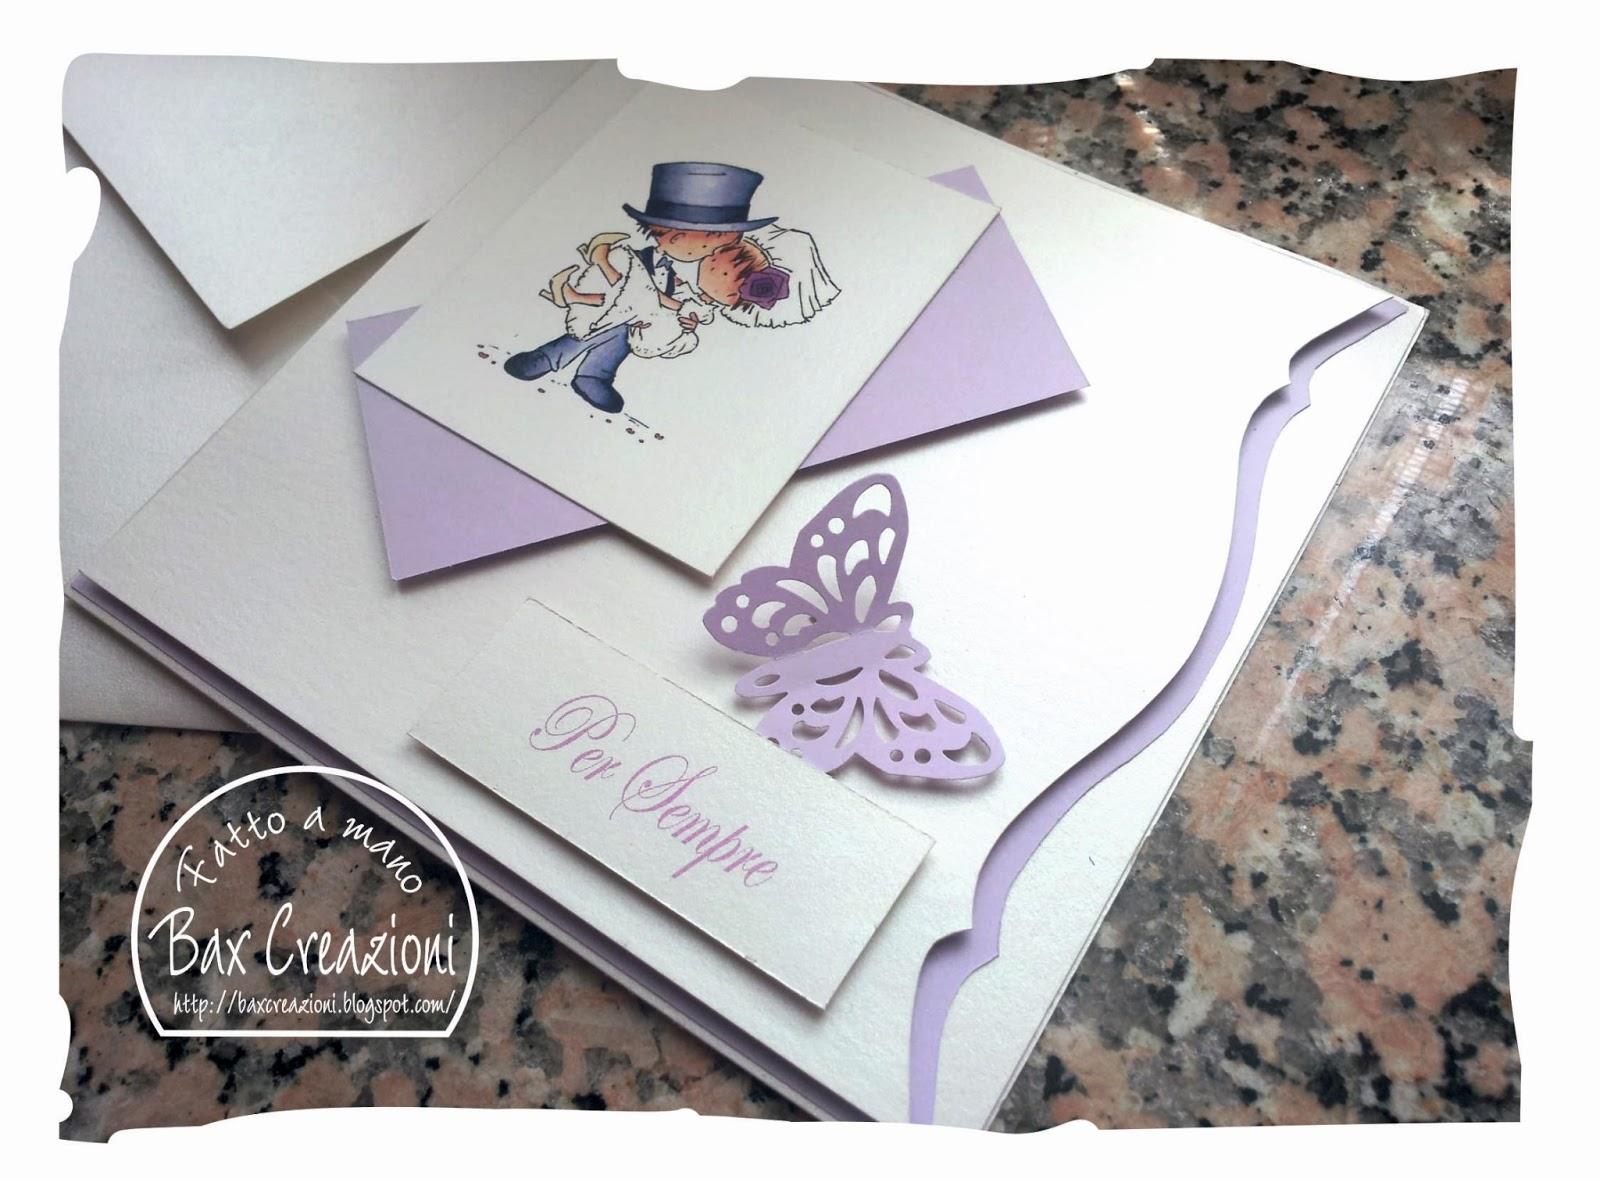 Auguri Per Un Matrimonio : Bax creazioni card d auguri per un matrimonio